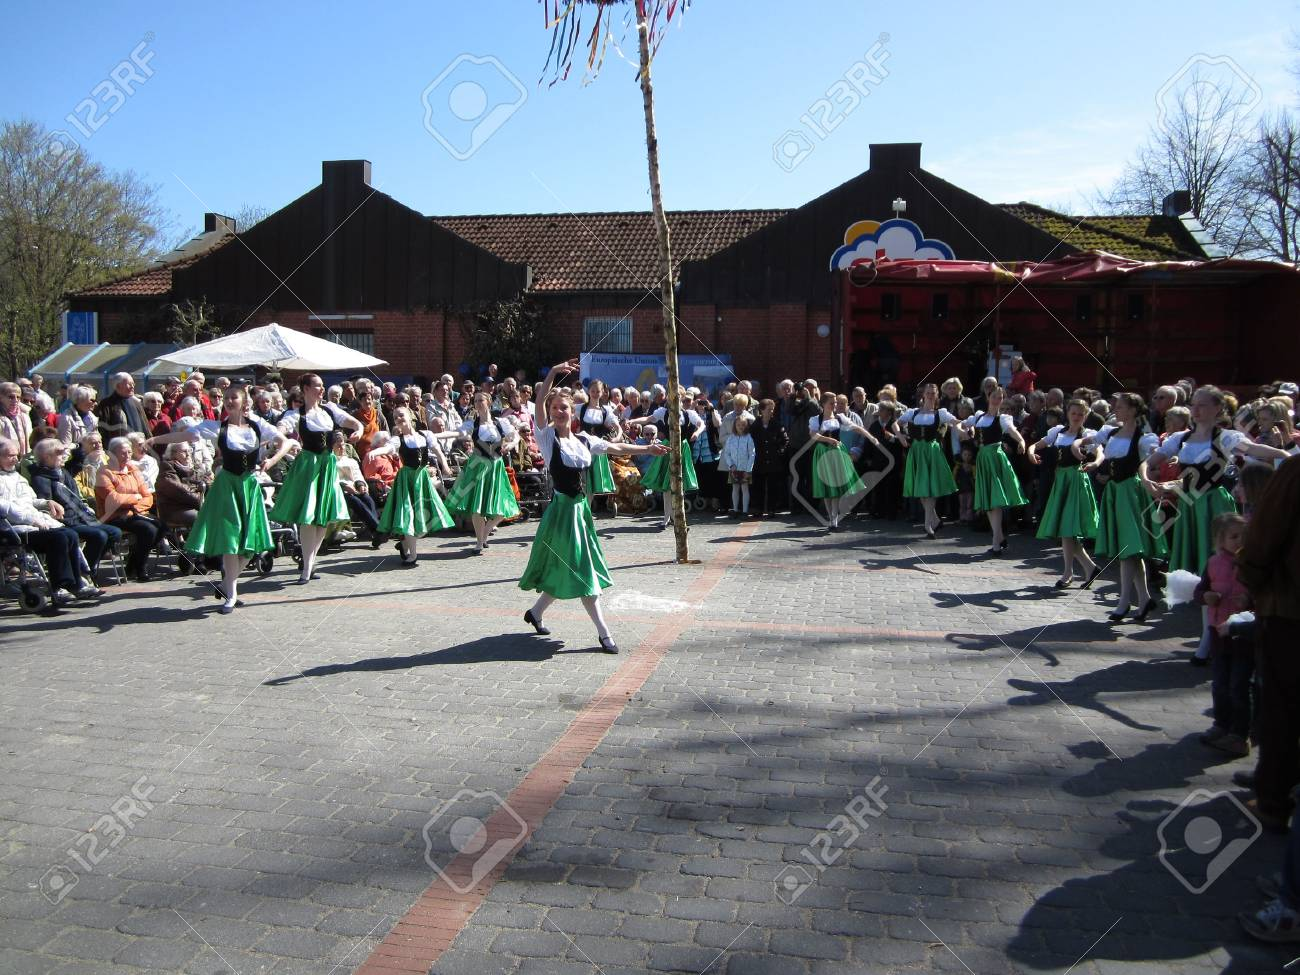 Dancing around the maypole Stock Photo - 24048098